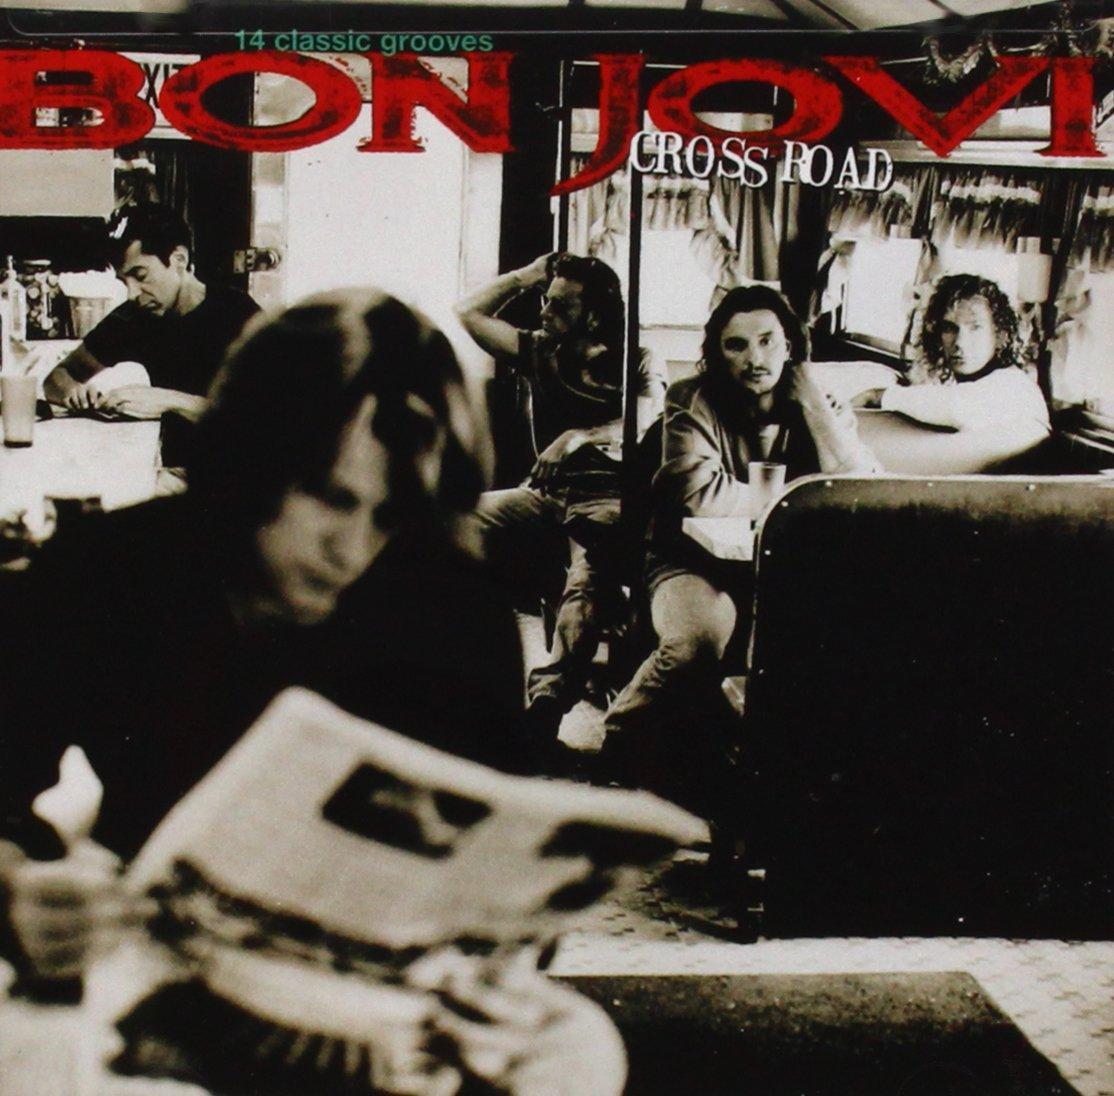 Cross road bon jovi reviews in cds chickadvisor for Classic house albums